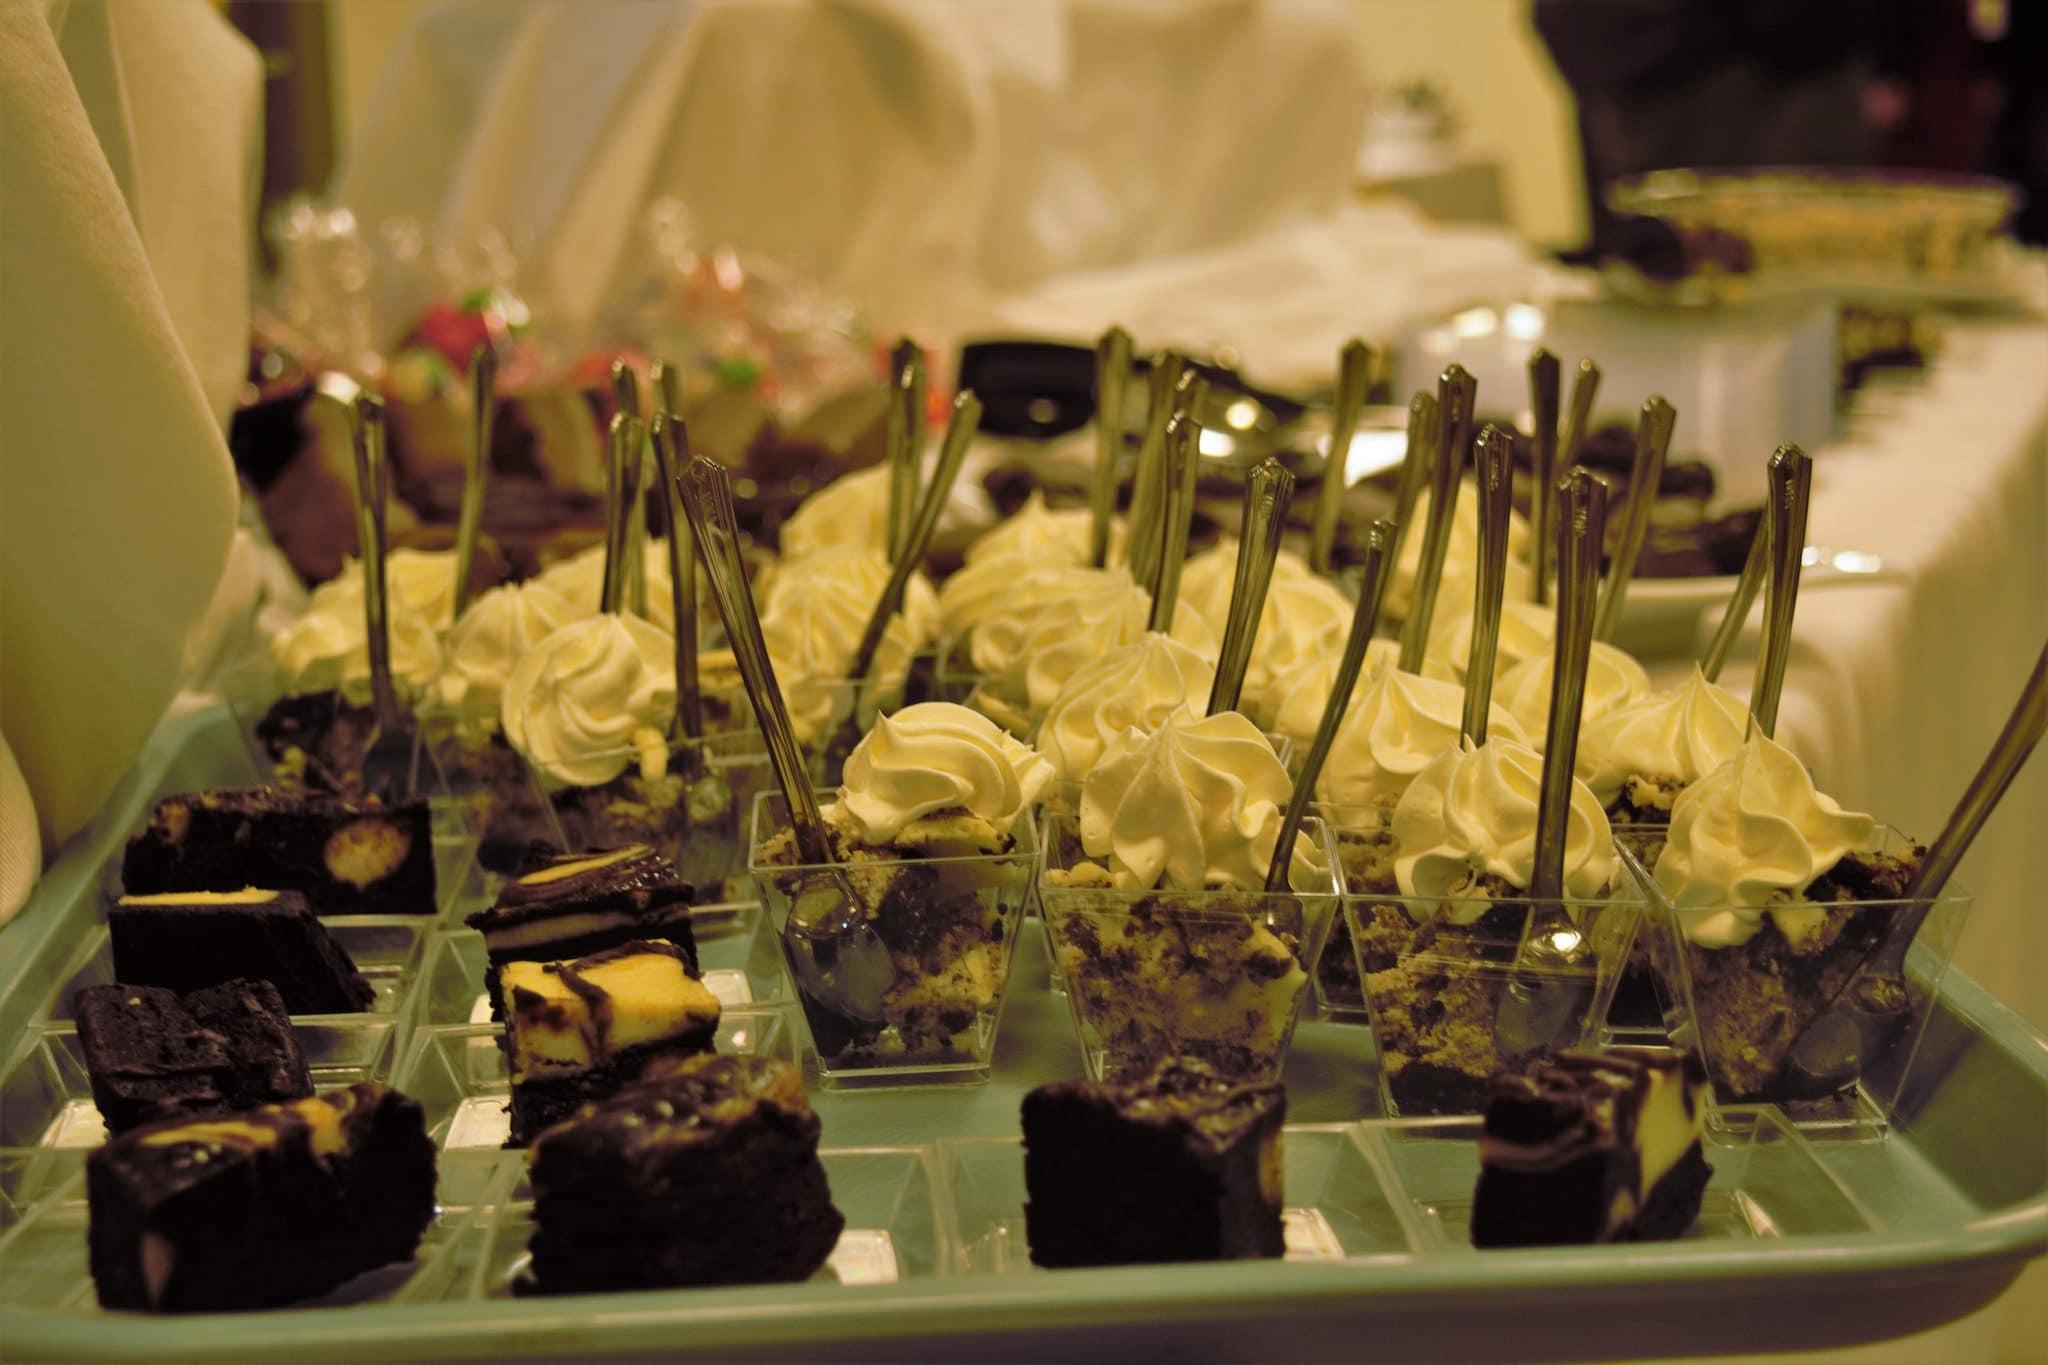 2018 Annual Meeting desserts + food